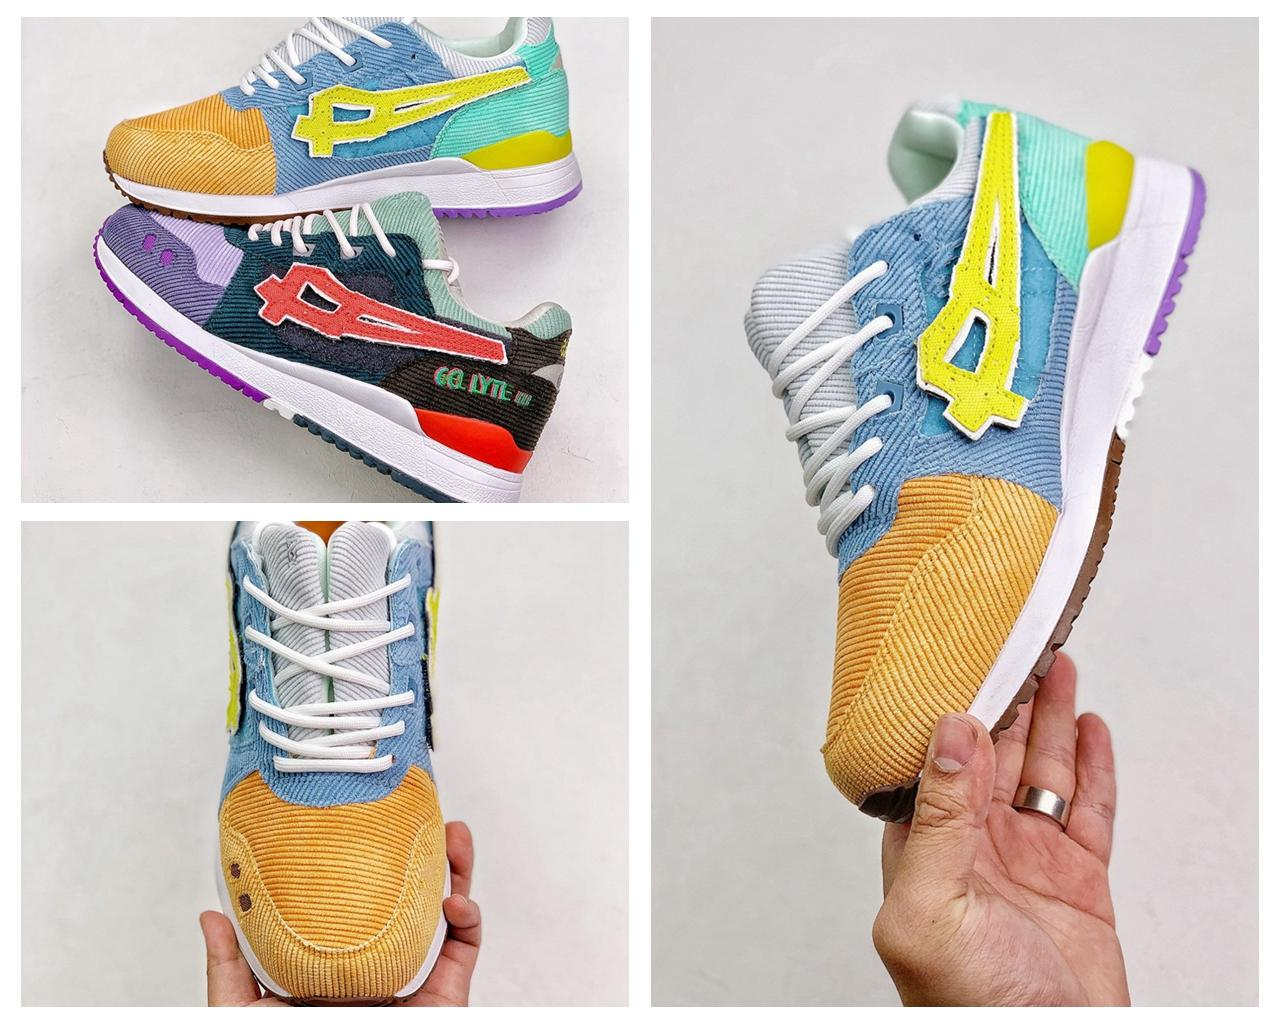 Gel-Lyte III Sean Wotherspoon Atmos Shoes Running Shoes Boys Girls Gel Lyte III 3.0 Zapatillas de deporte Multi Color Tamaño 36-44